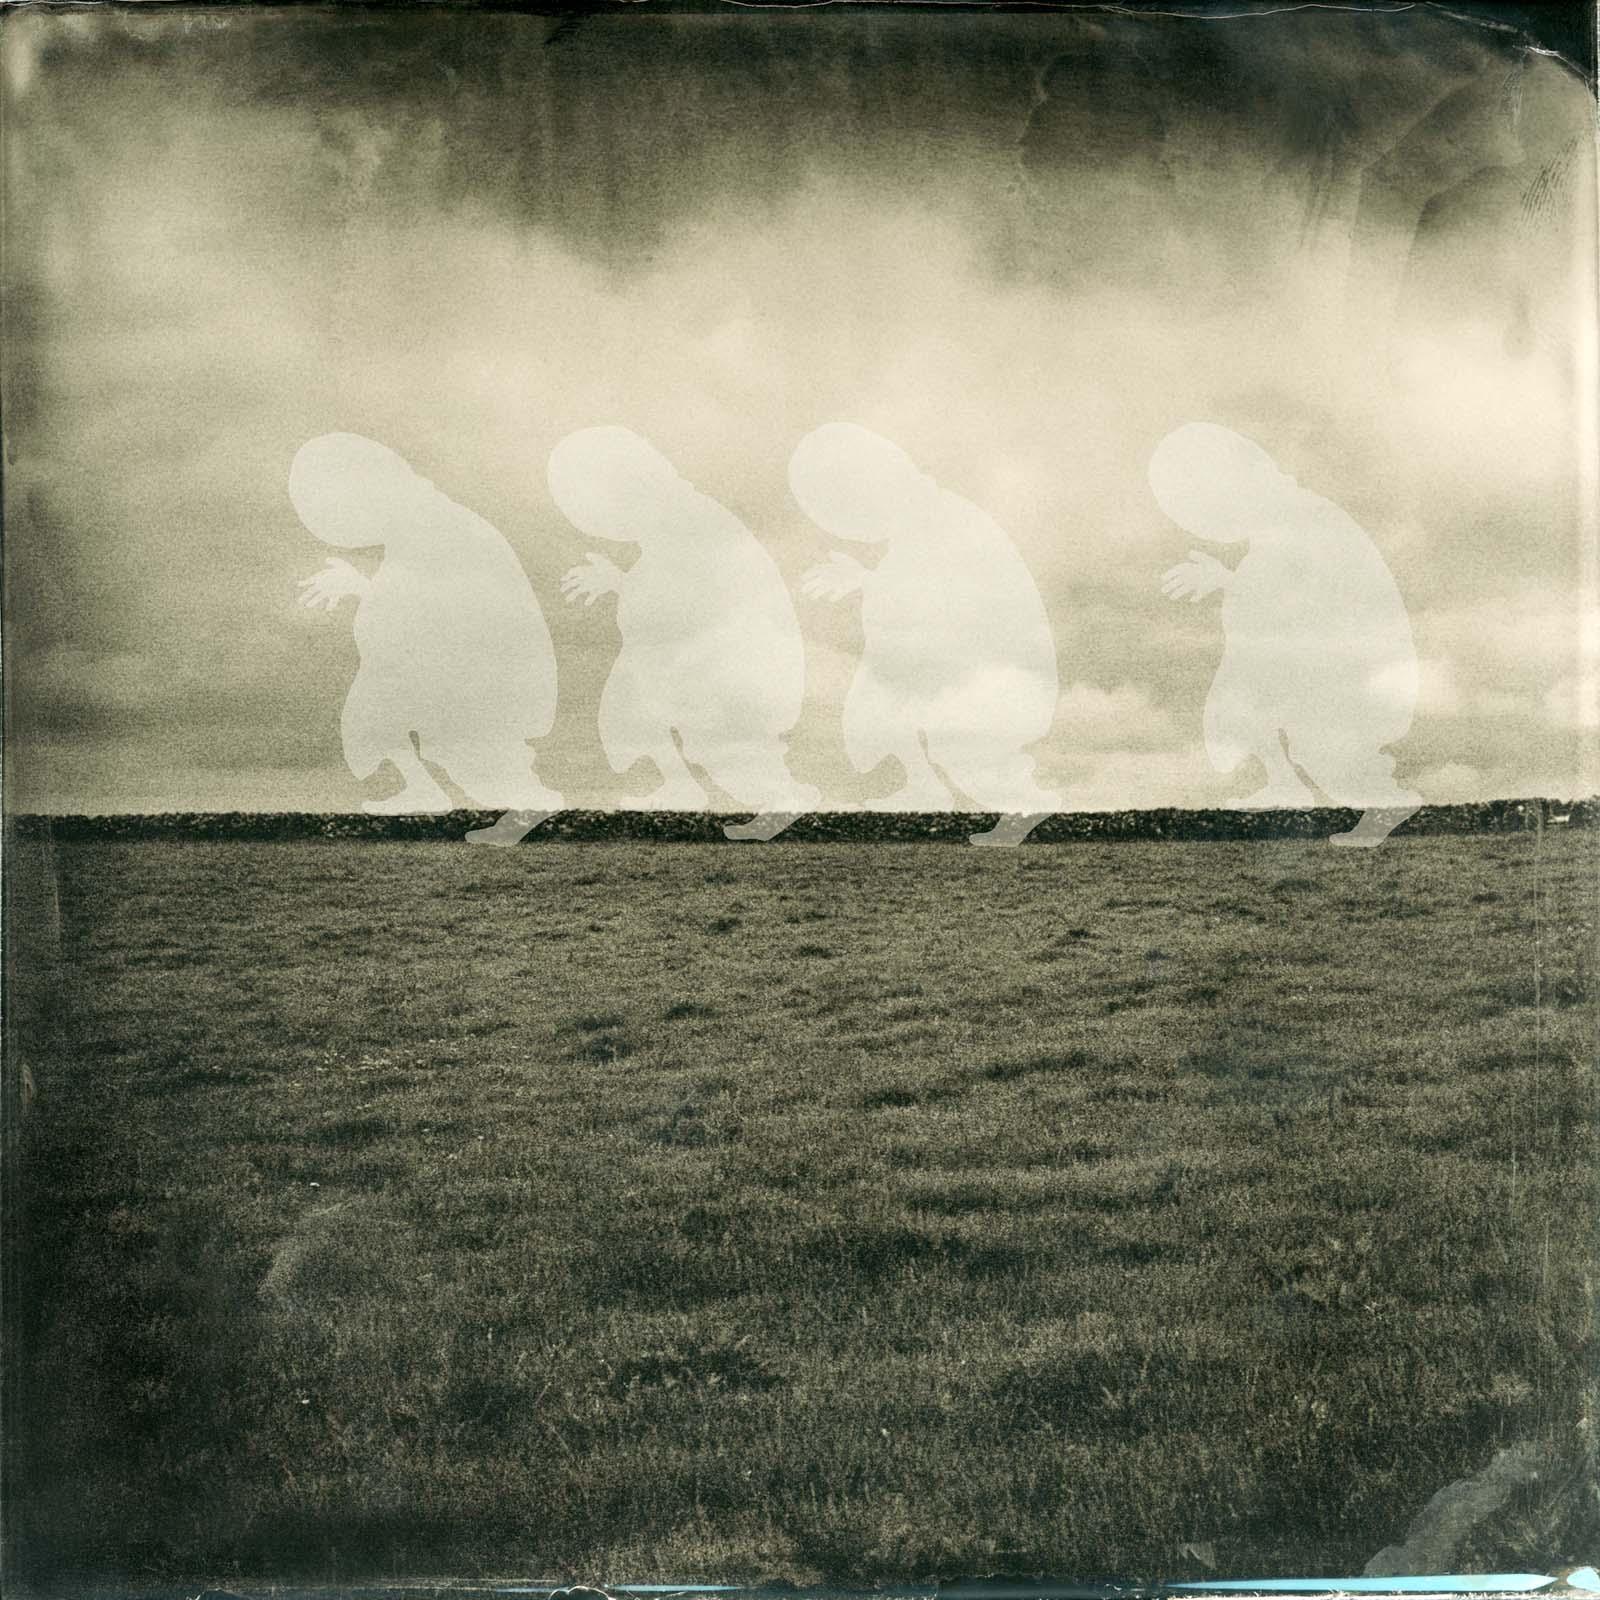 Shadow Marchers, 2011